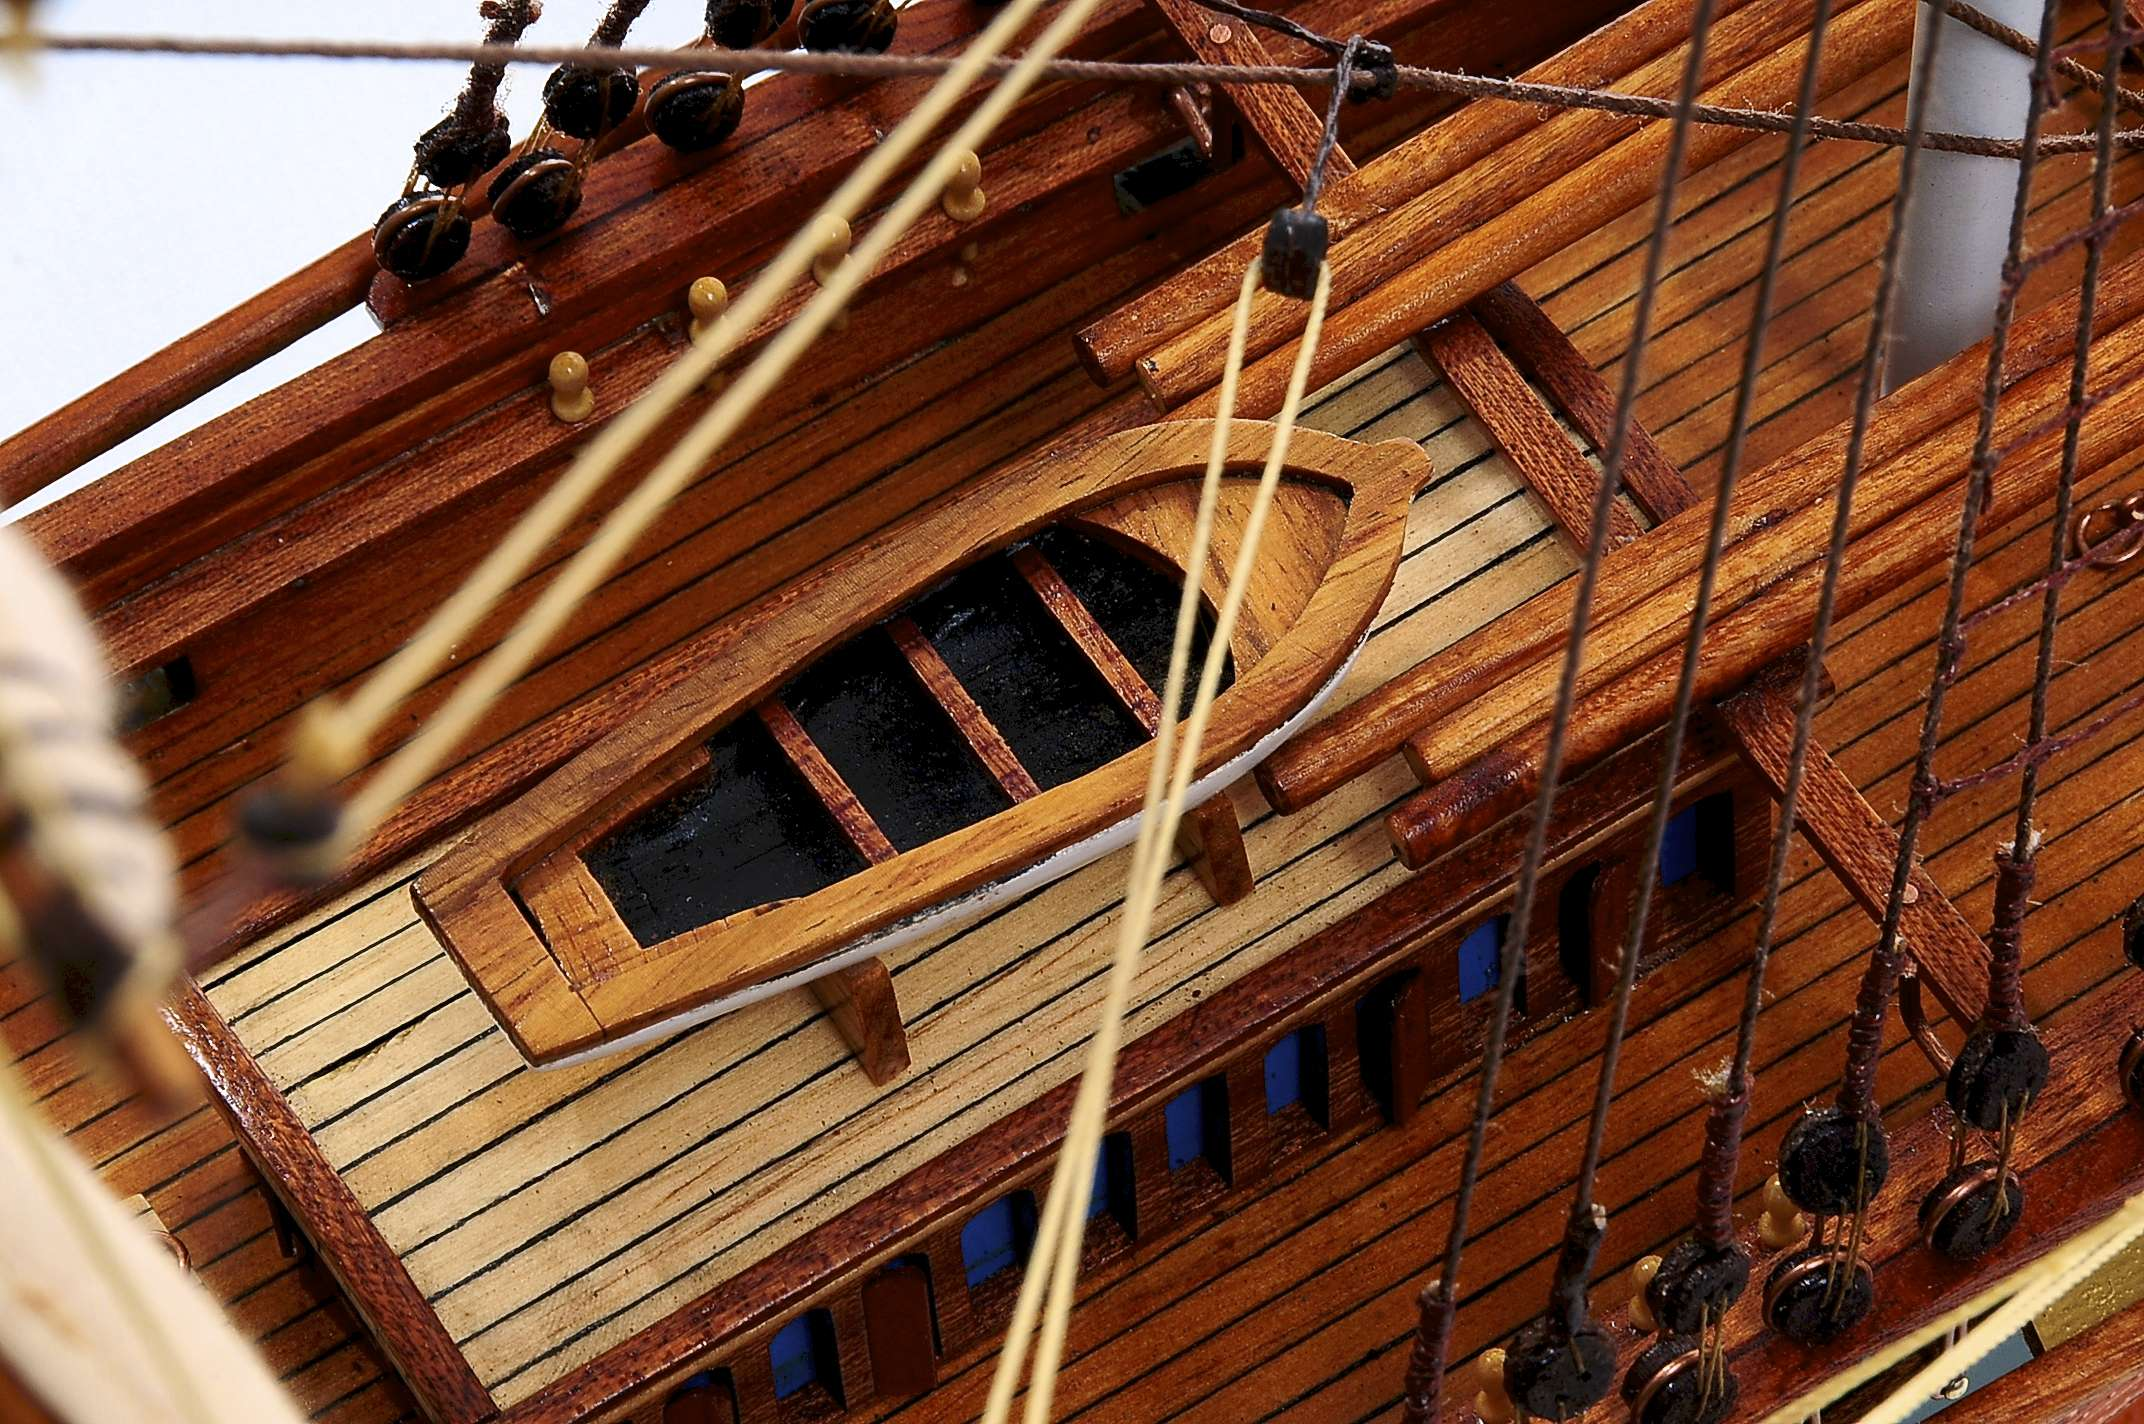 1434-4867-Thermopylae-Model-Boat